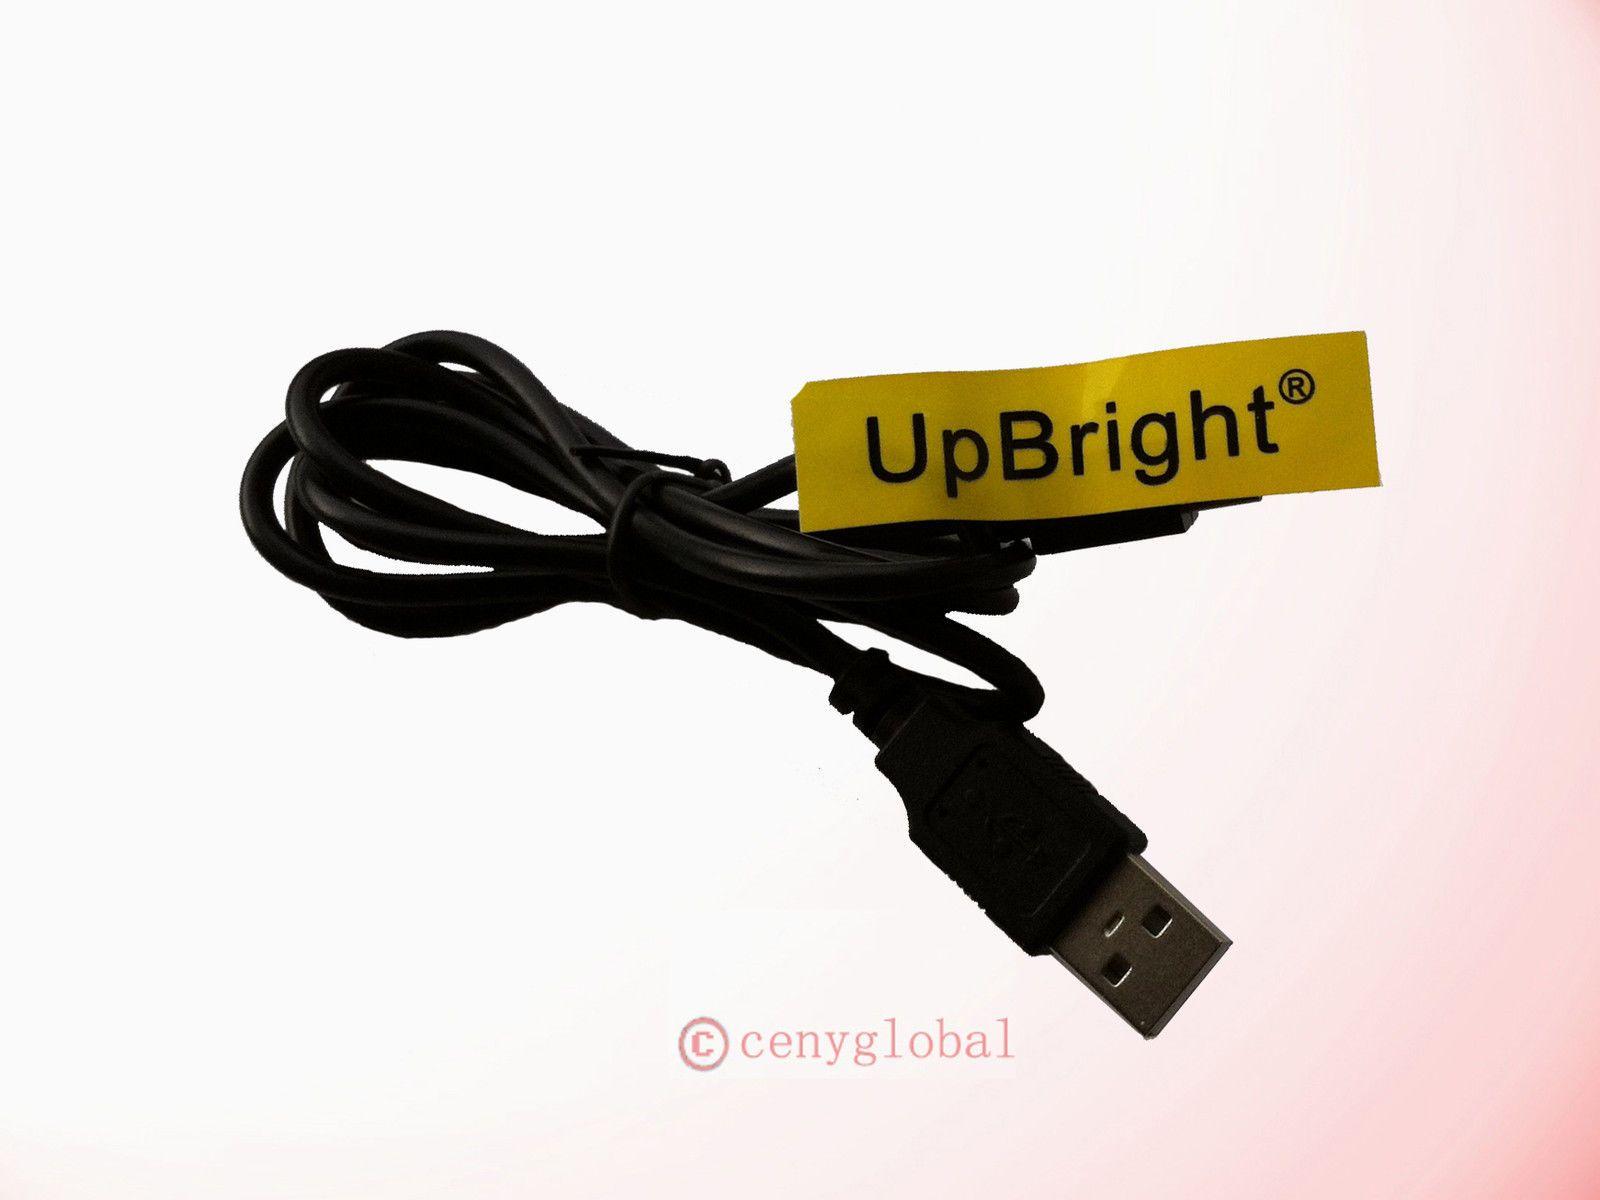 USB Cable Cord For Lexmark Z611 X3430 X5320 X4530 X1240 Z517 X1100 X1180 Printer